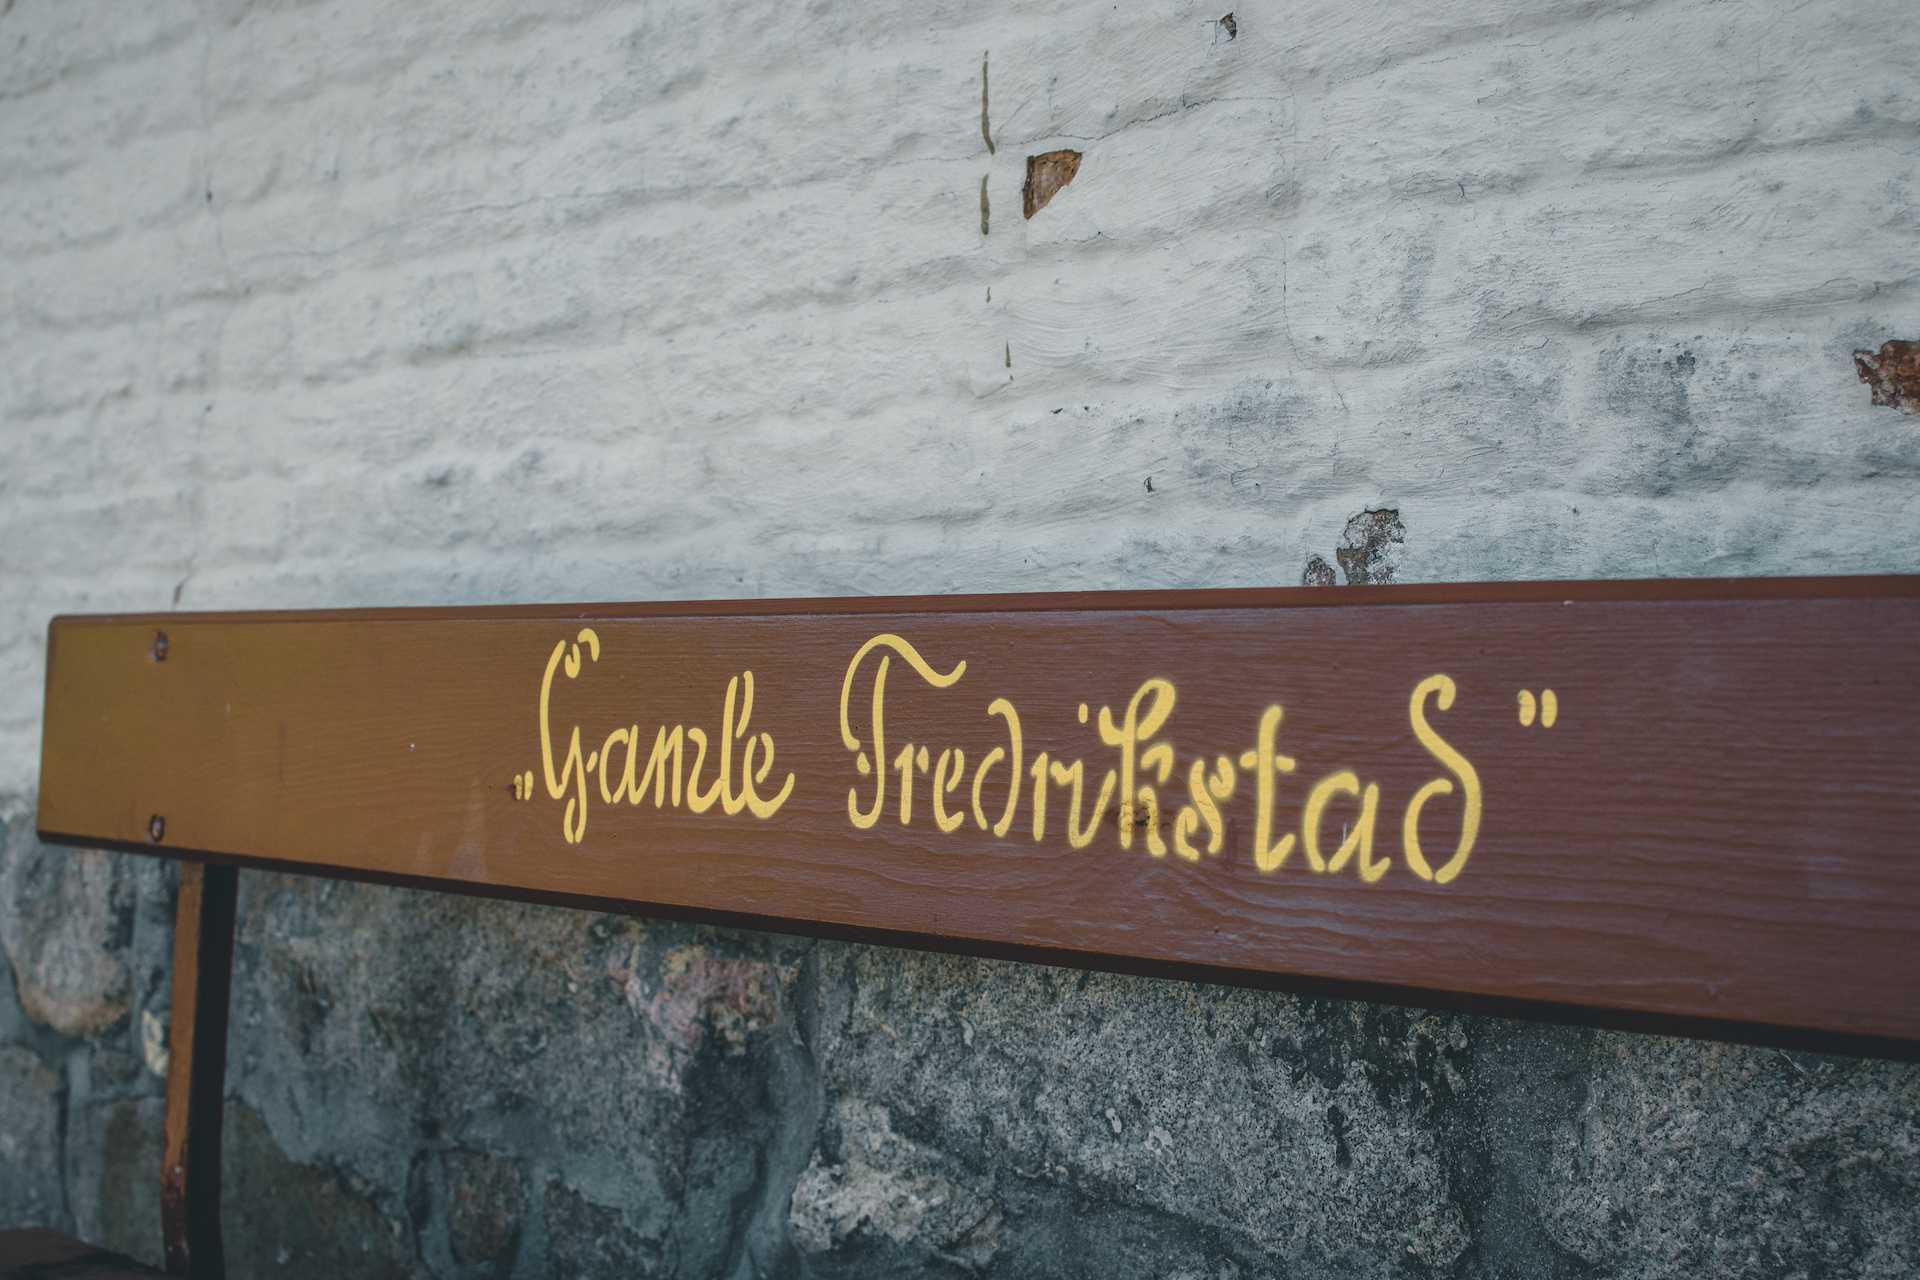 Fredrikstad stare miasto